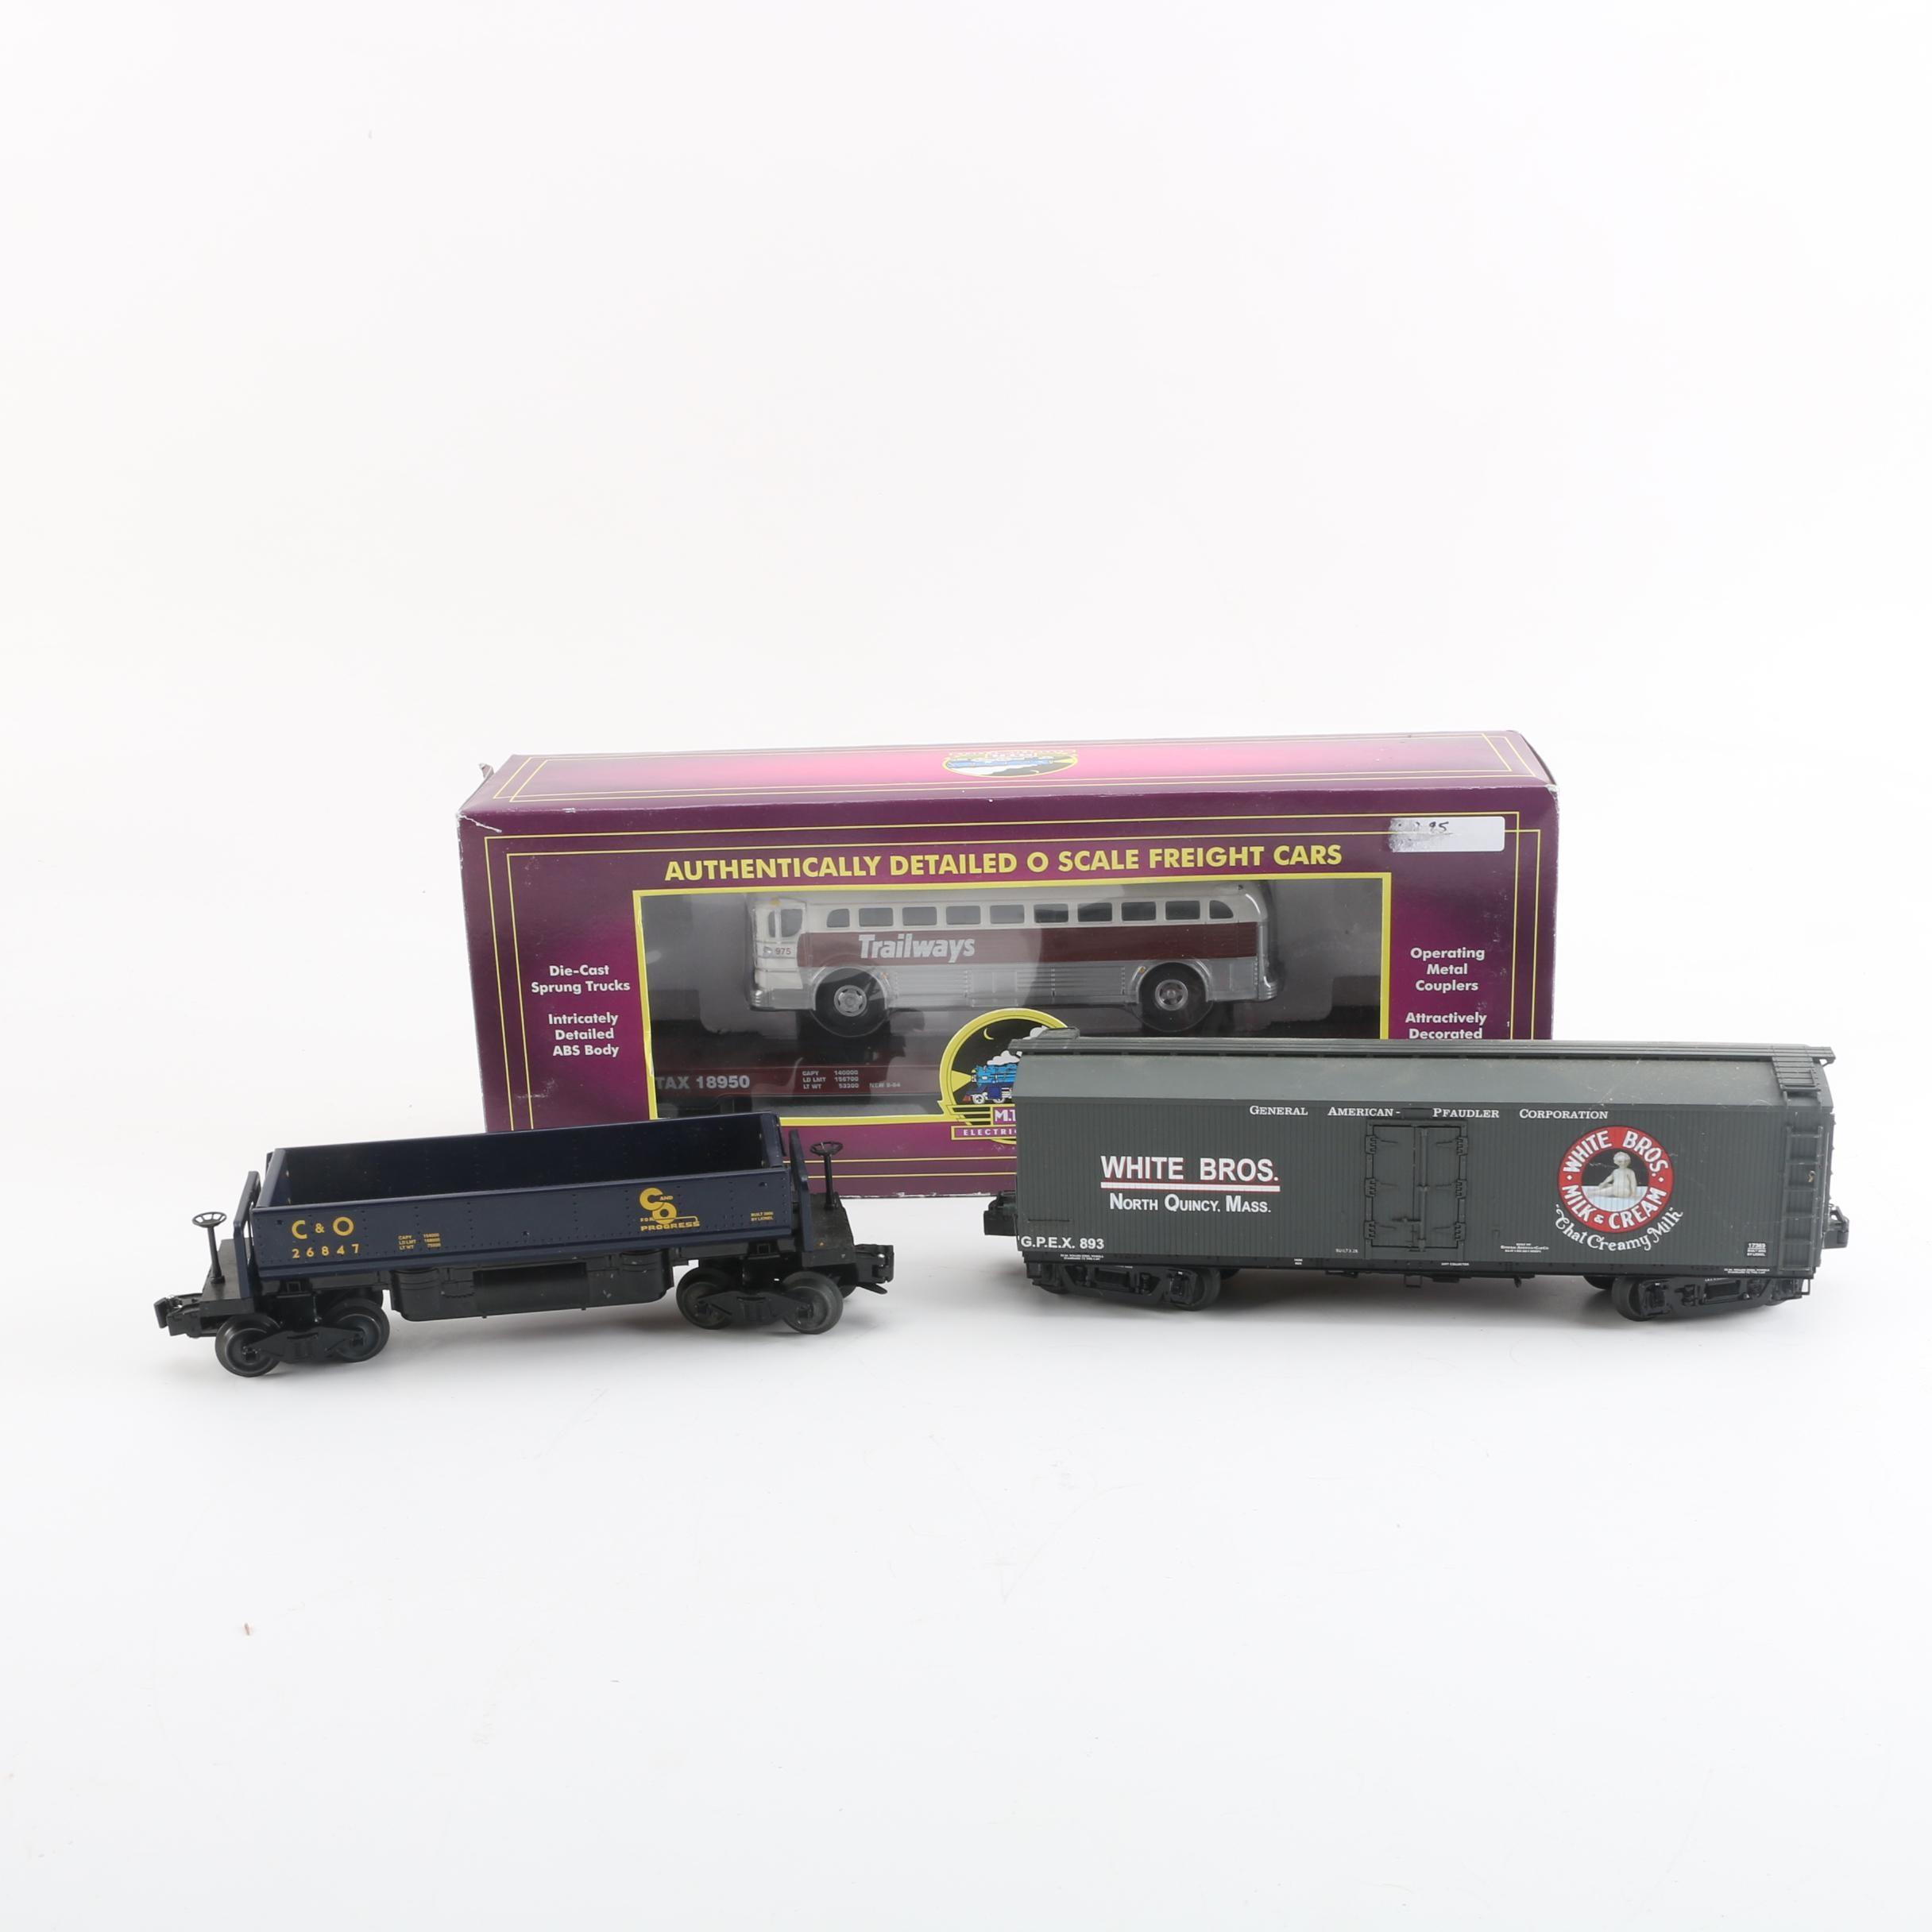 Lionel and M.T.H. Train Cars Including C&O Coal Dump Car